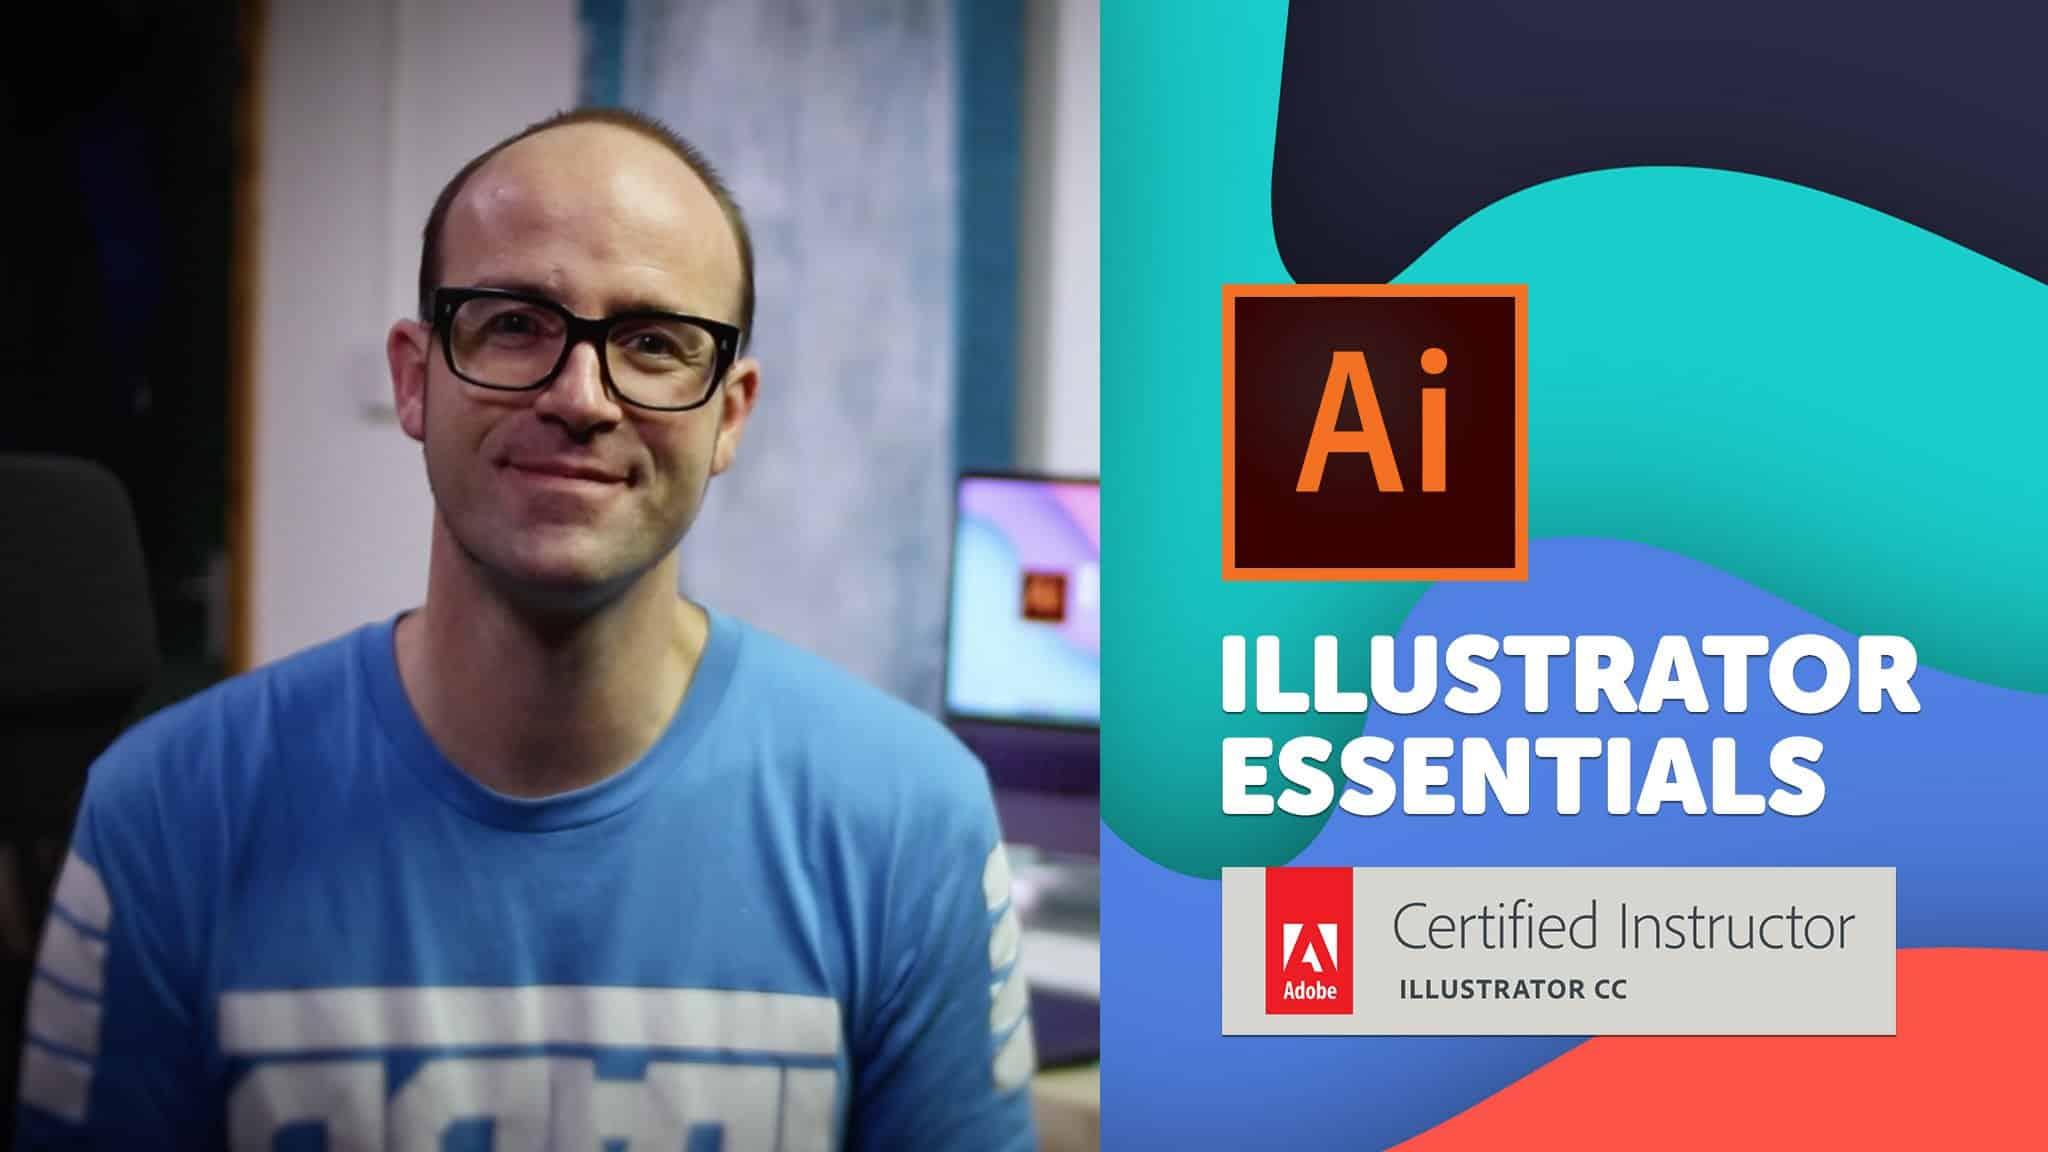 [Skillshare] Adobe Illustrator CC – Essentials Training